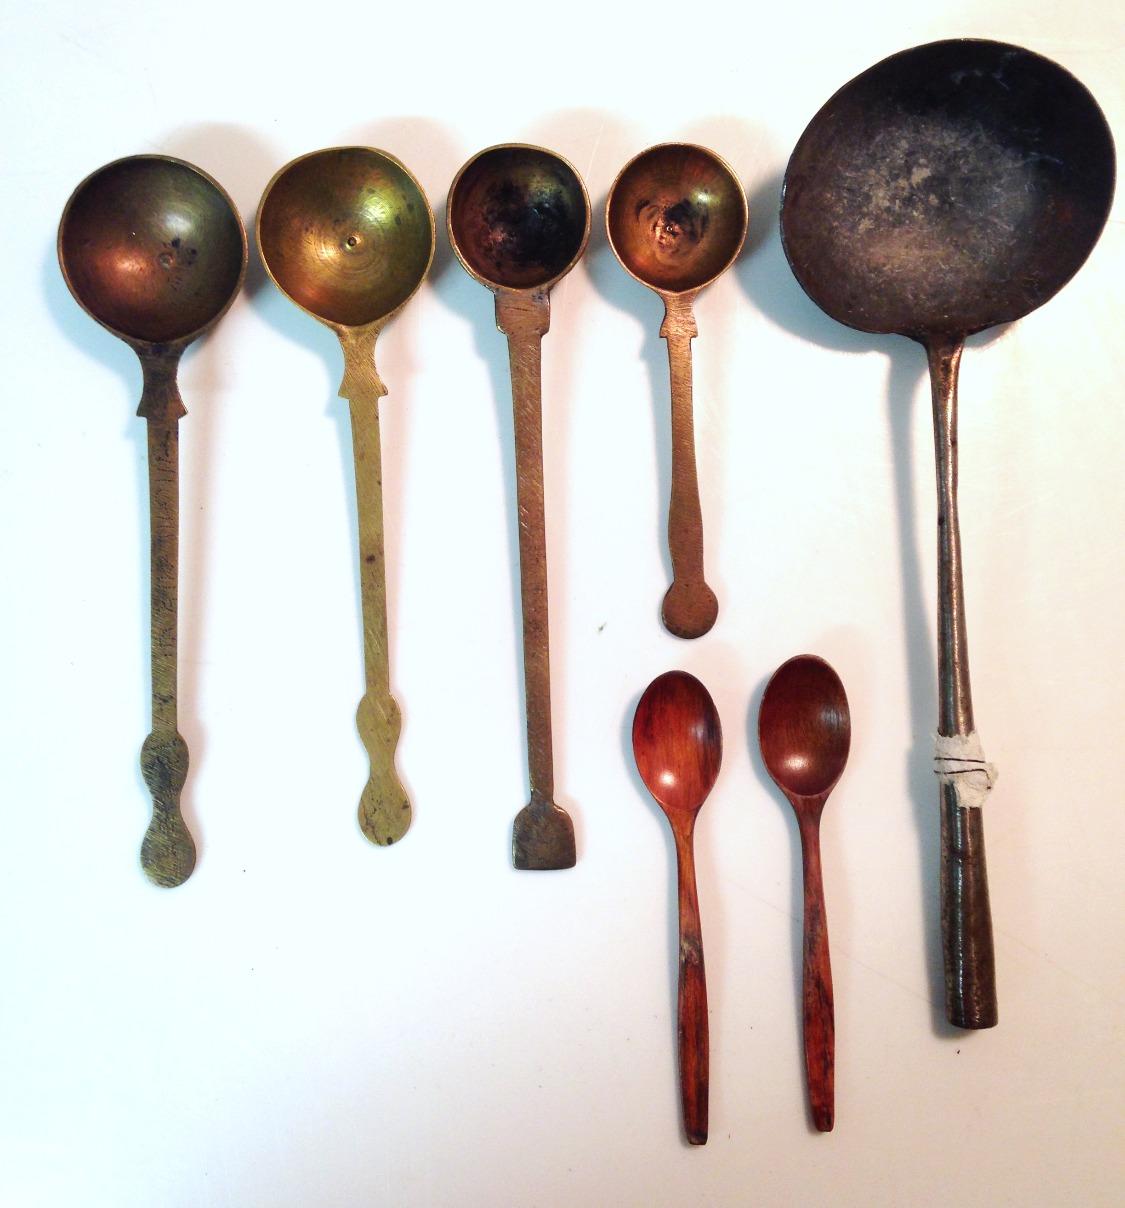 Antique Ladles